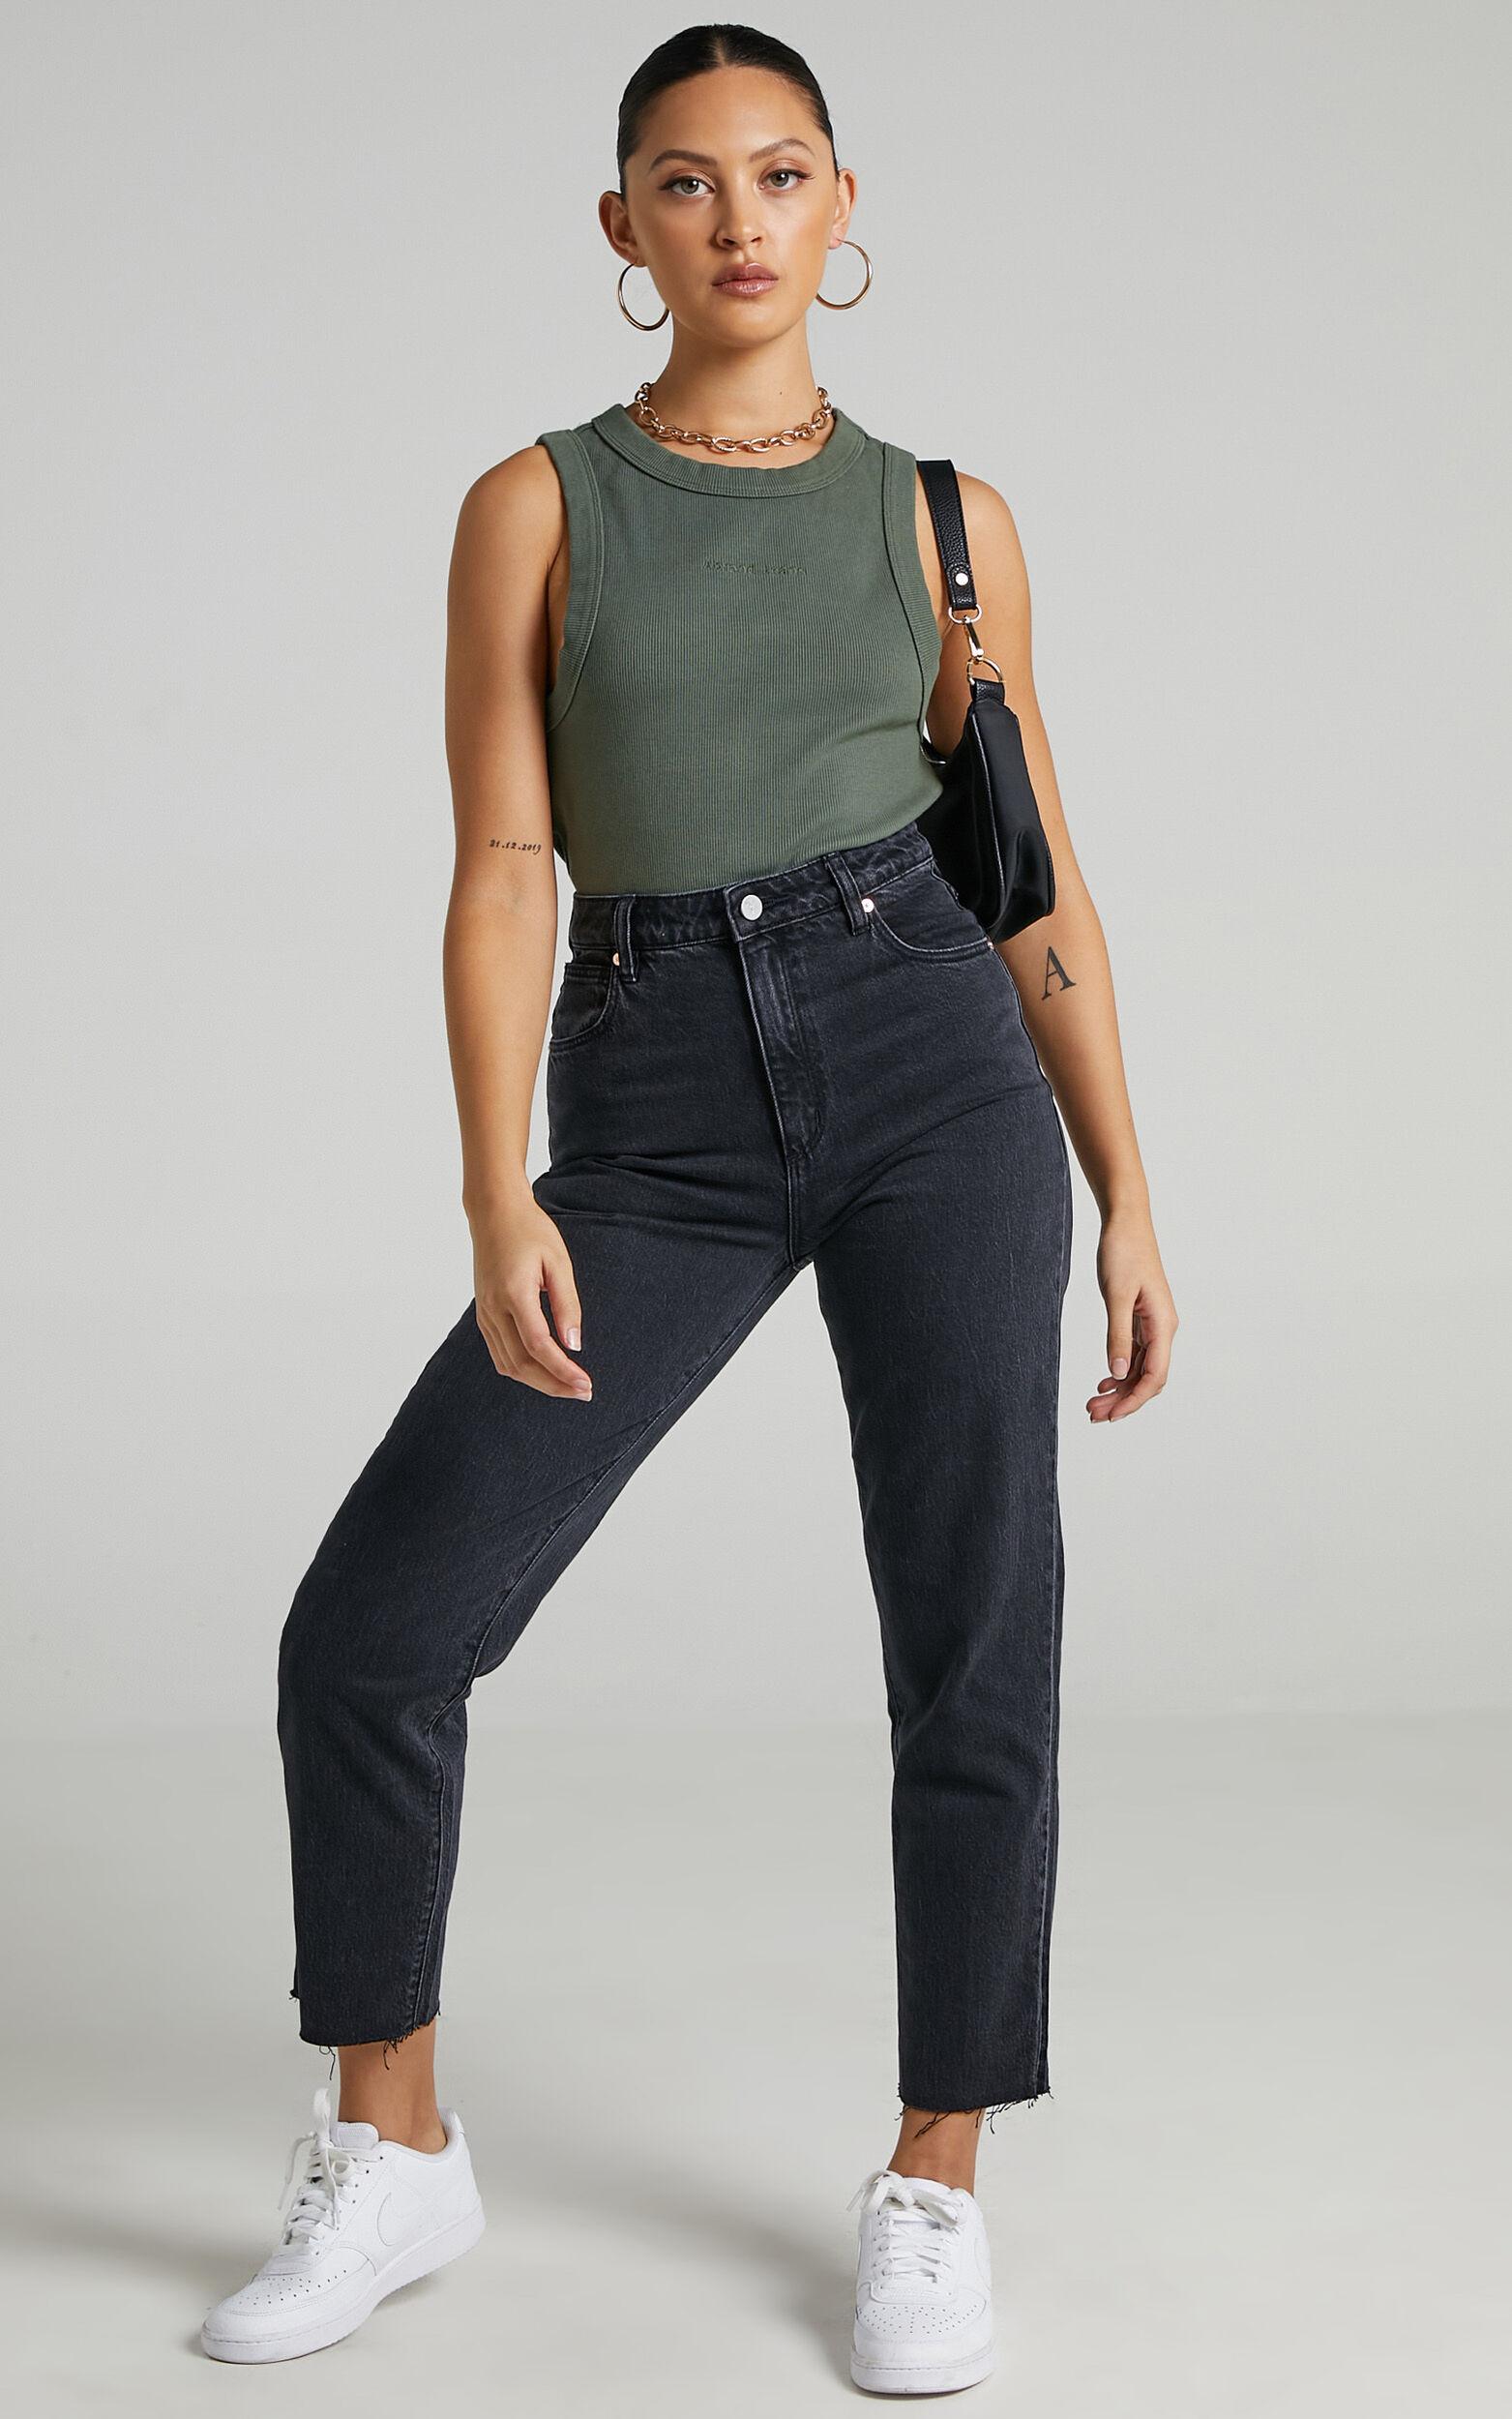 Abrand - A 94 High Slim Jean in Charo Black - 06, BLK1, super-hi-res image number null